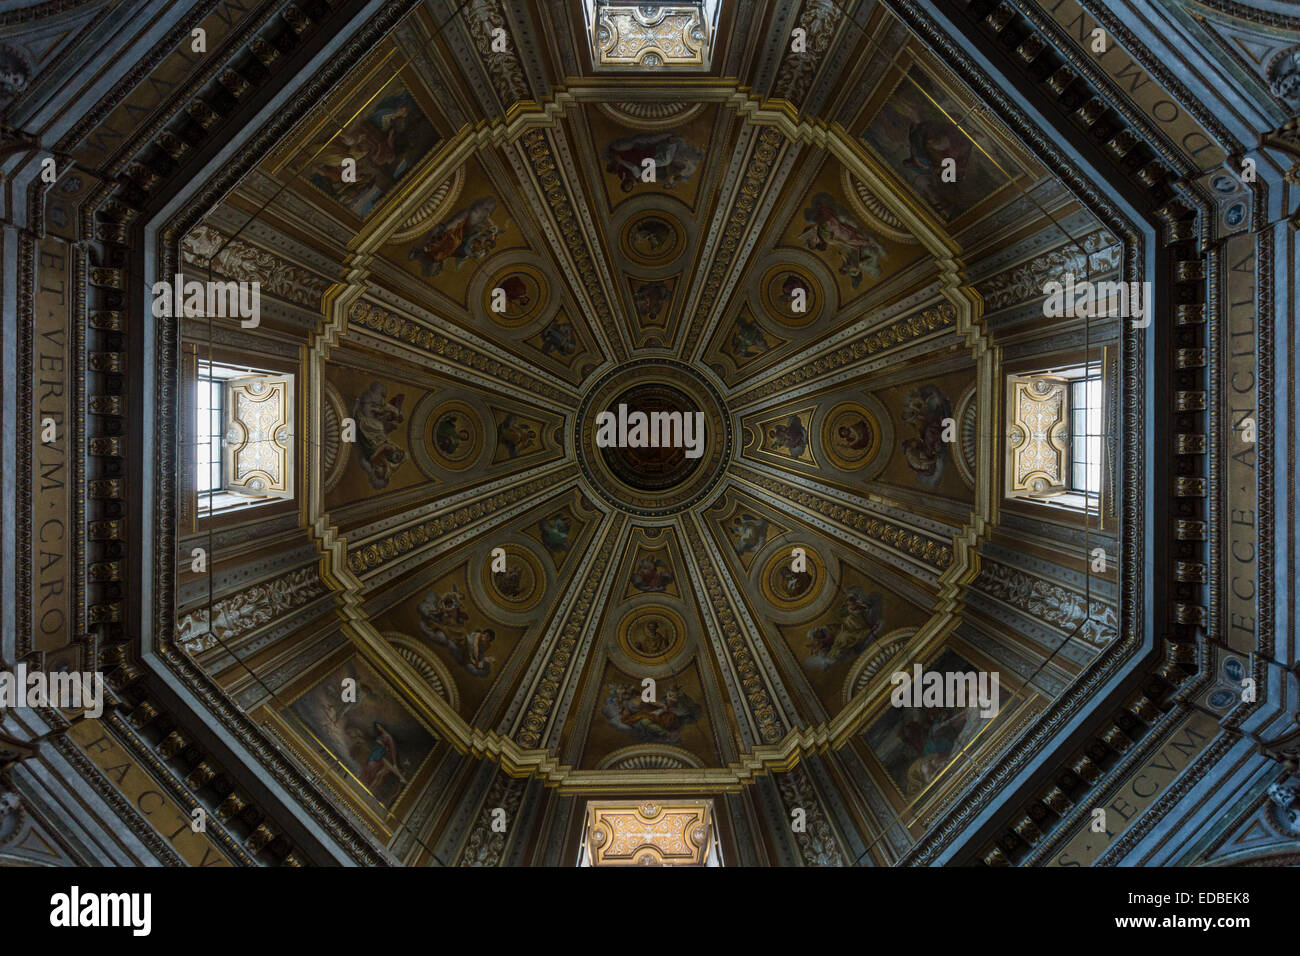 Santa Maria di Loreto, Rome, Italy - Stock Image